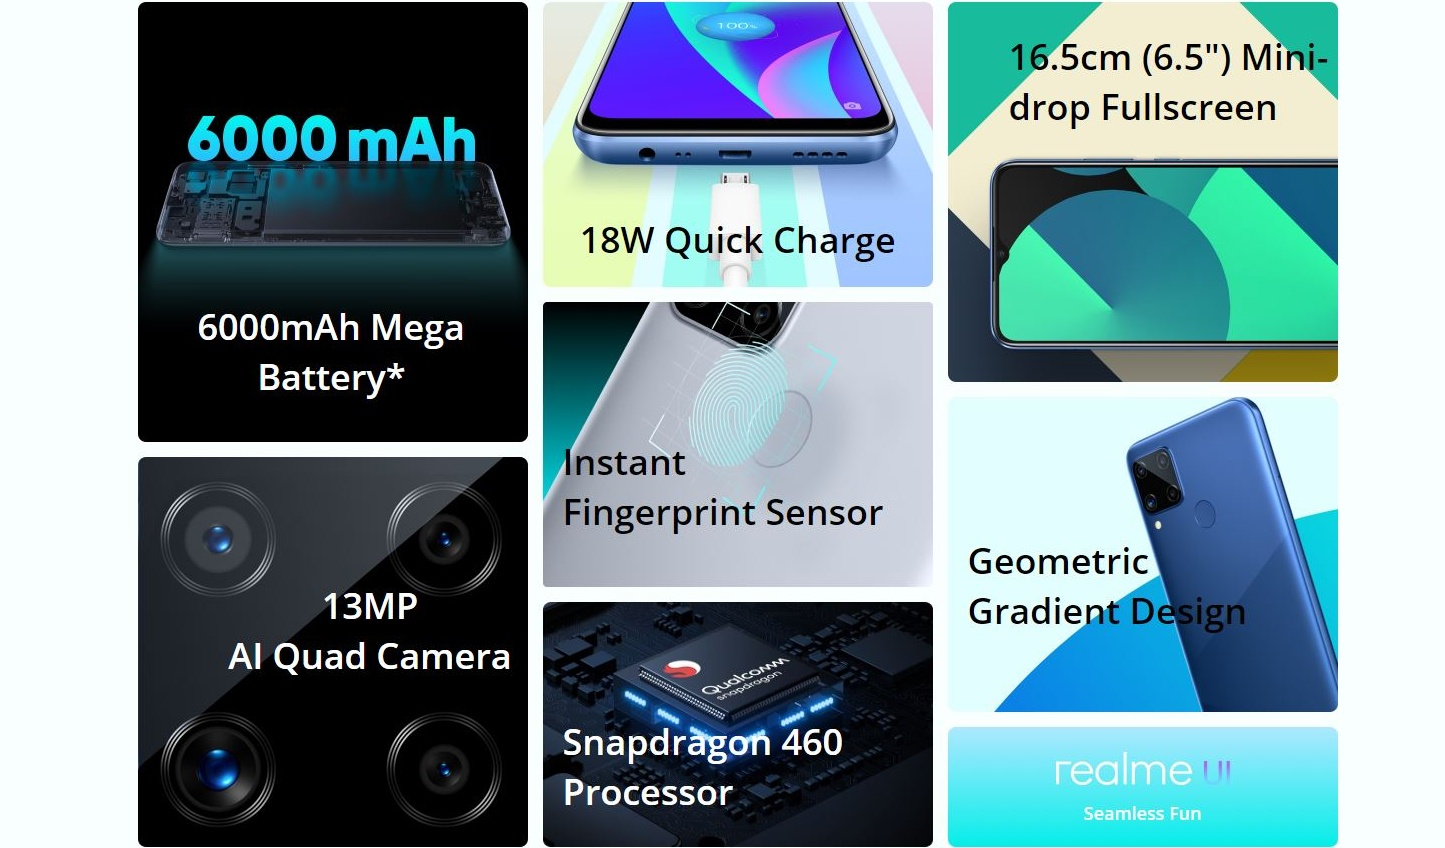 Realme C15 Qualcomm Edition 2 1445x848x